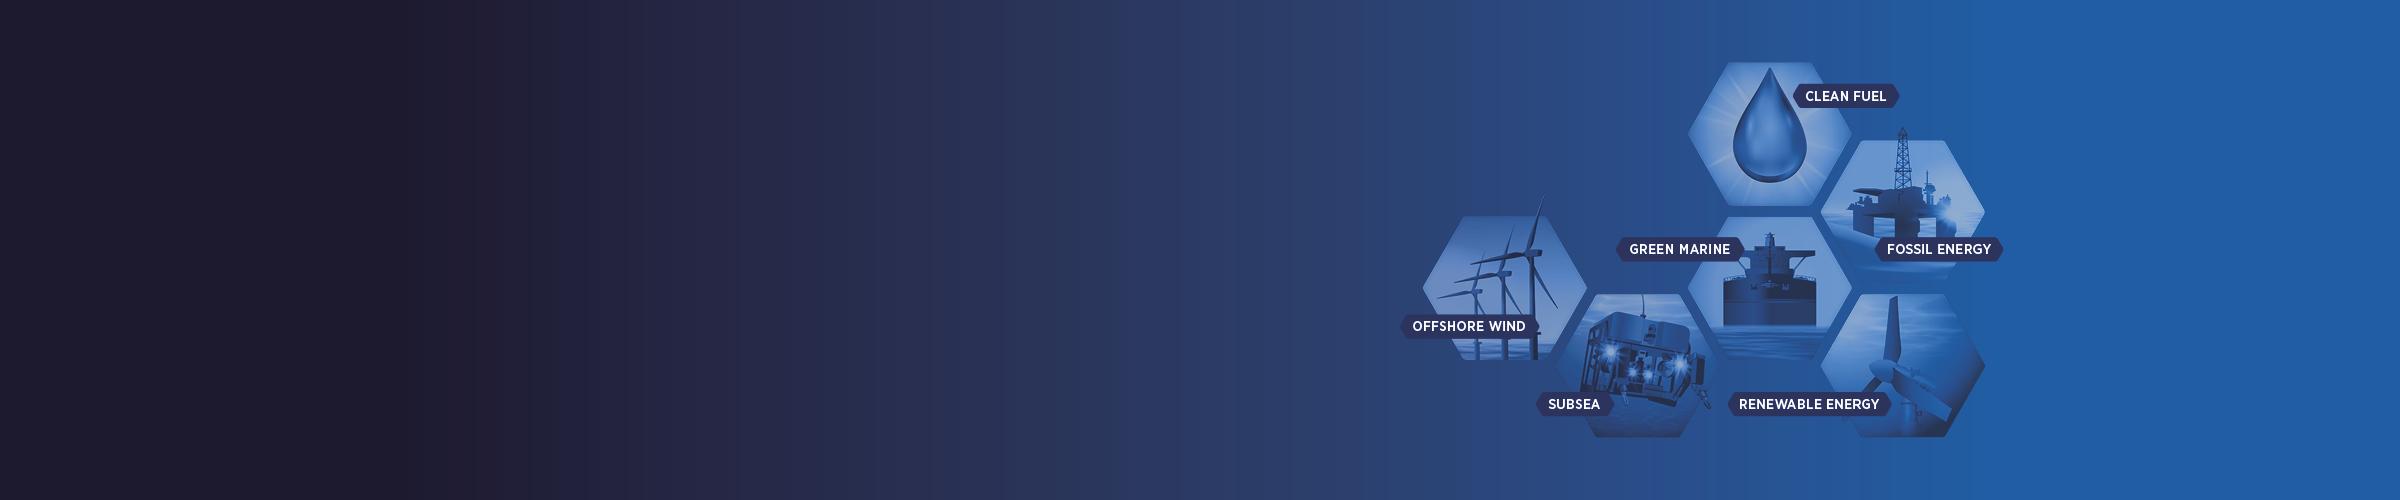 Companies Offshore Energy Platform